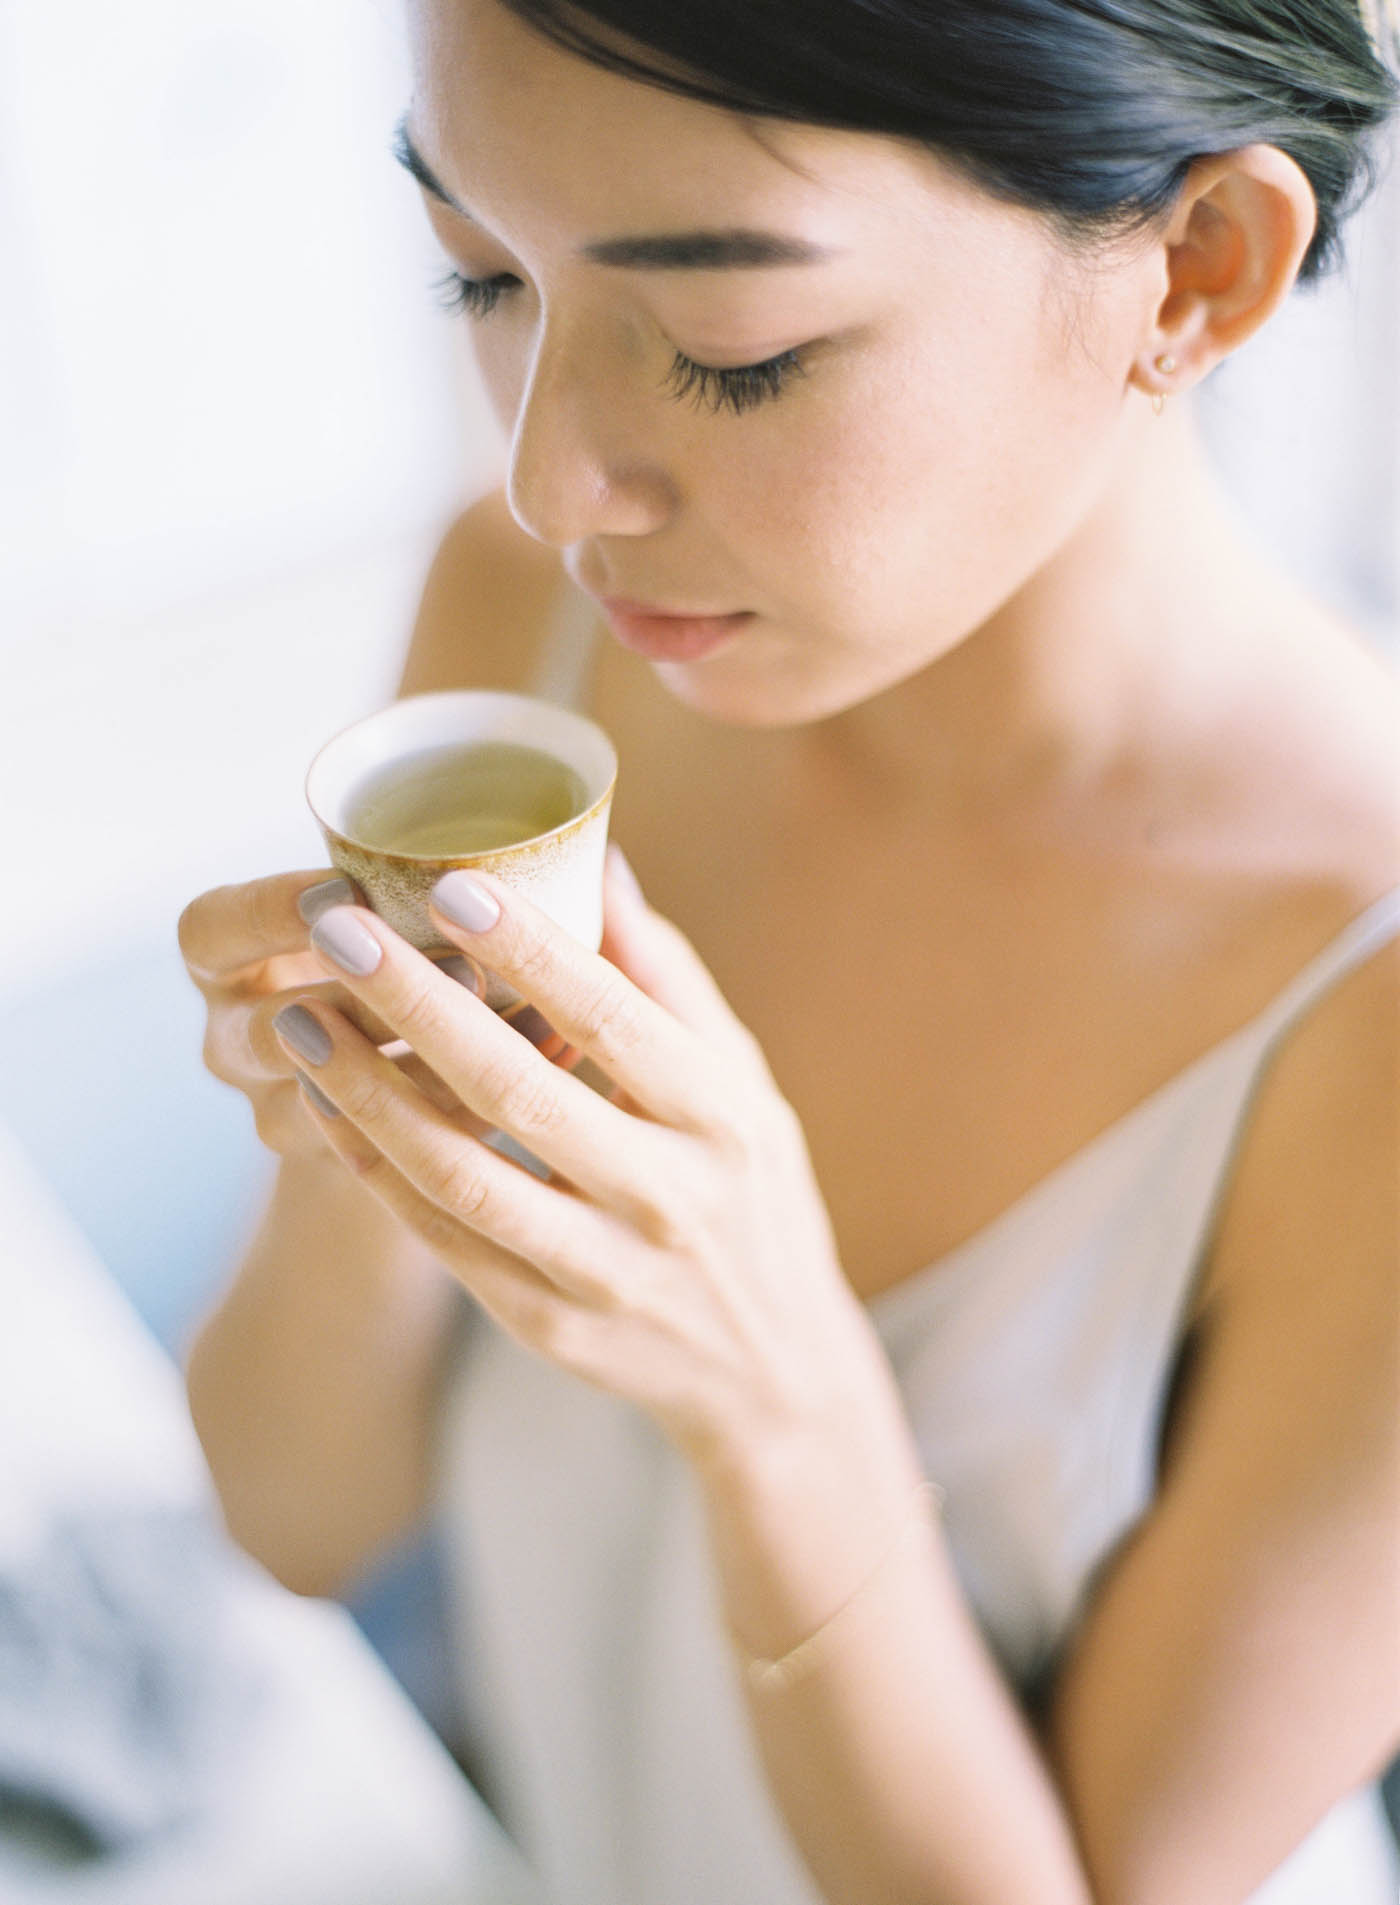 riviera-house-engagement-113-Jen_Huang-Tea-Ceremony-341-Jen_Huang-004143-R1-014.jpg